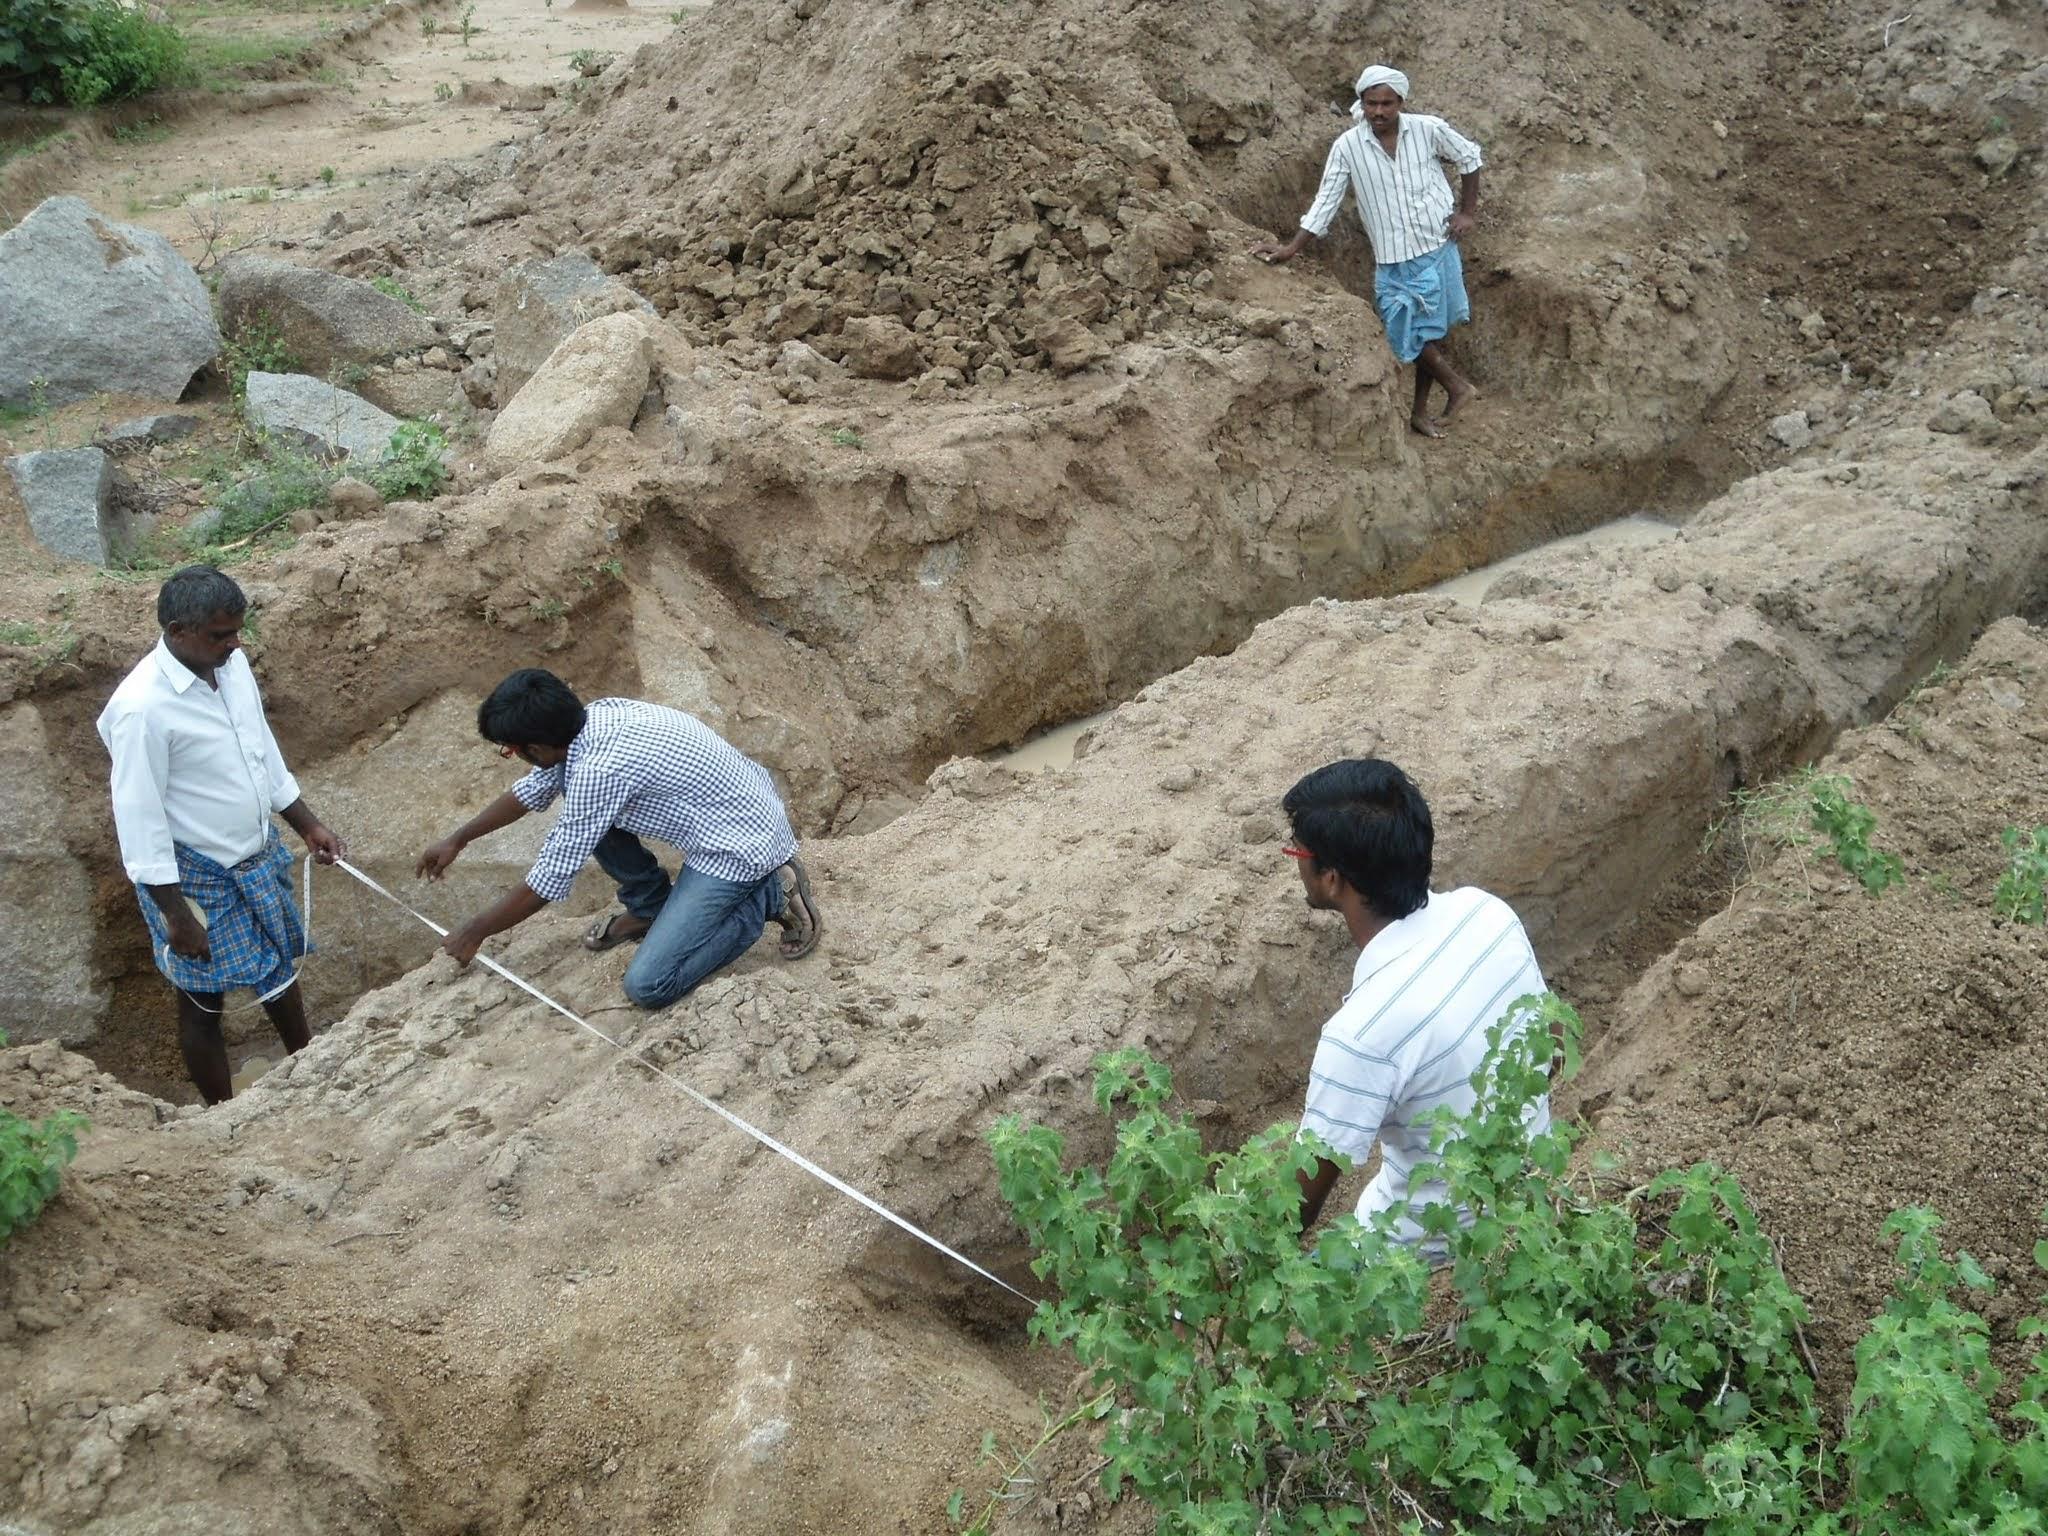 WATCH: Recharging groundwater levels in Telangana